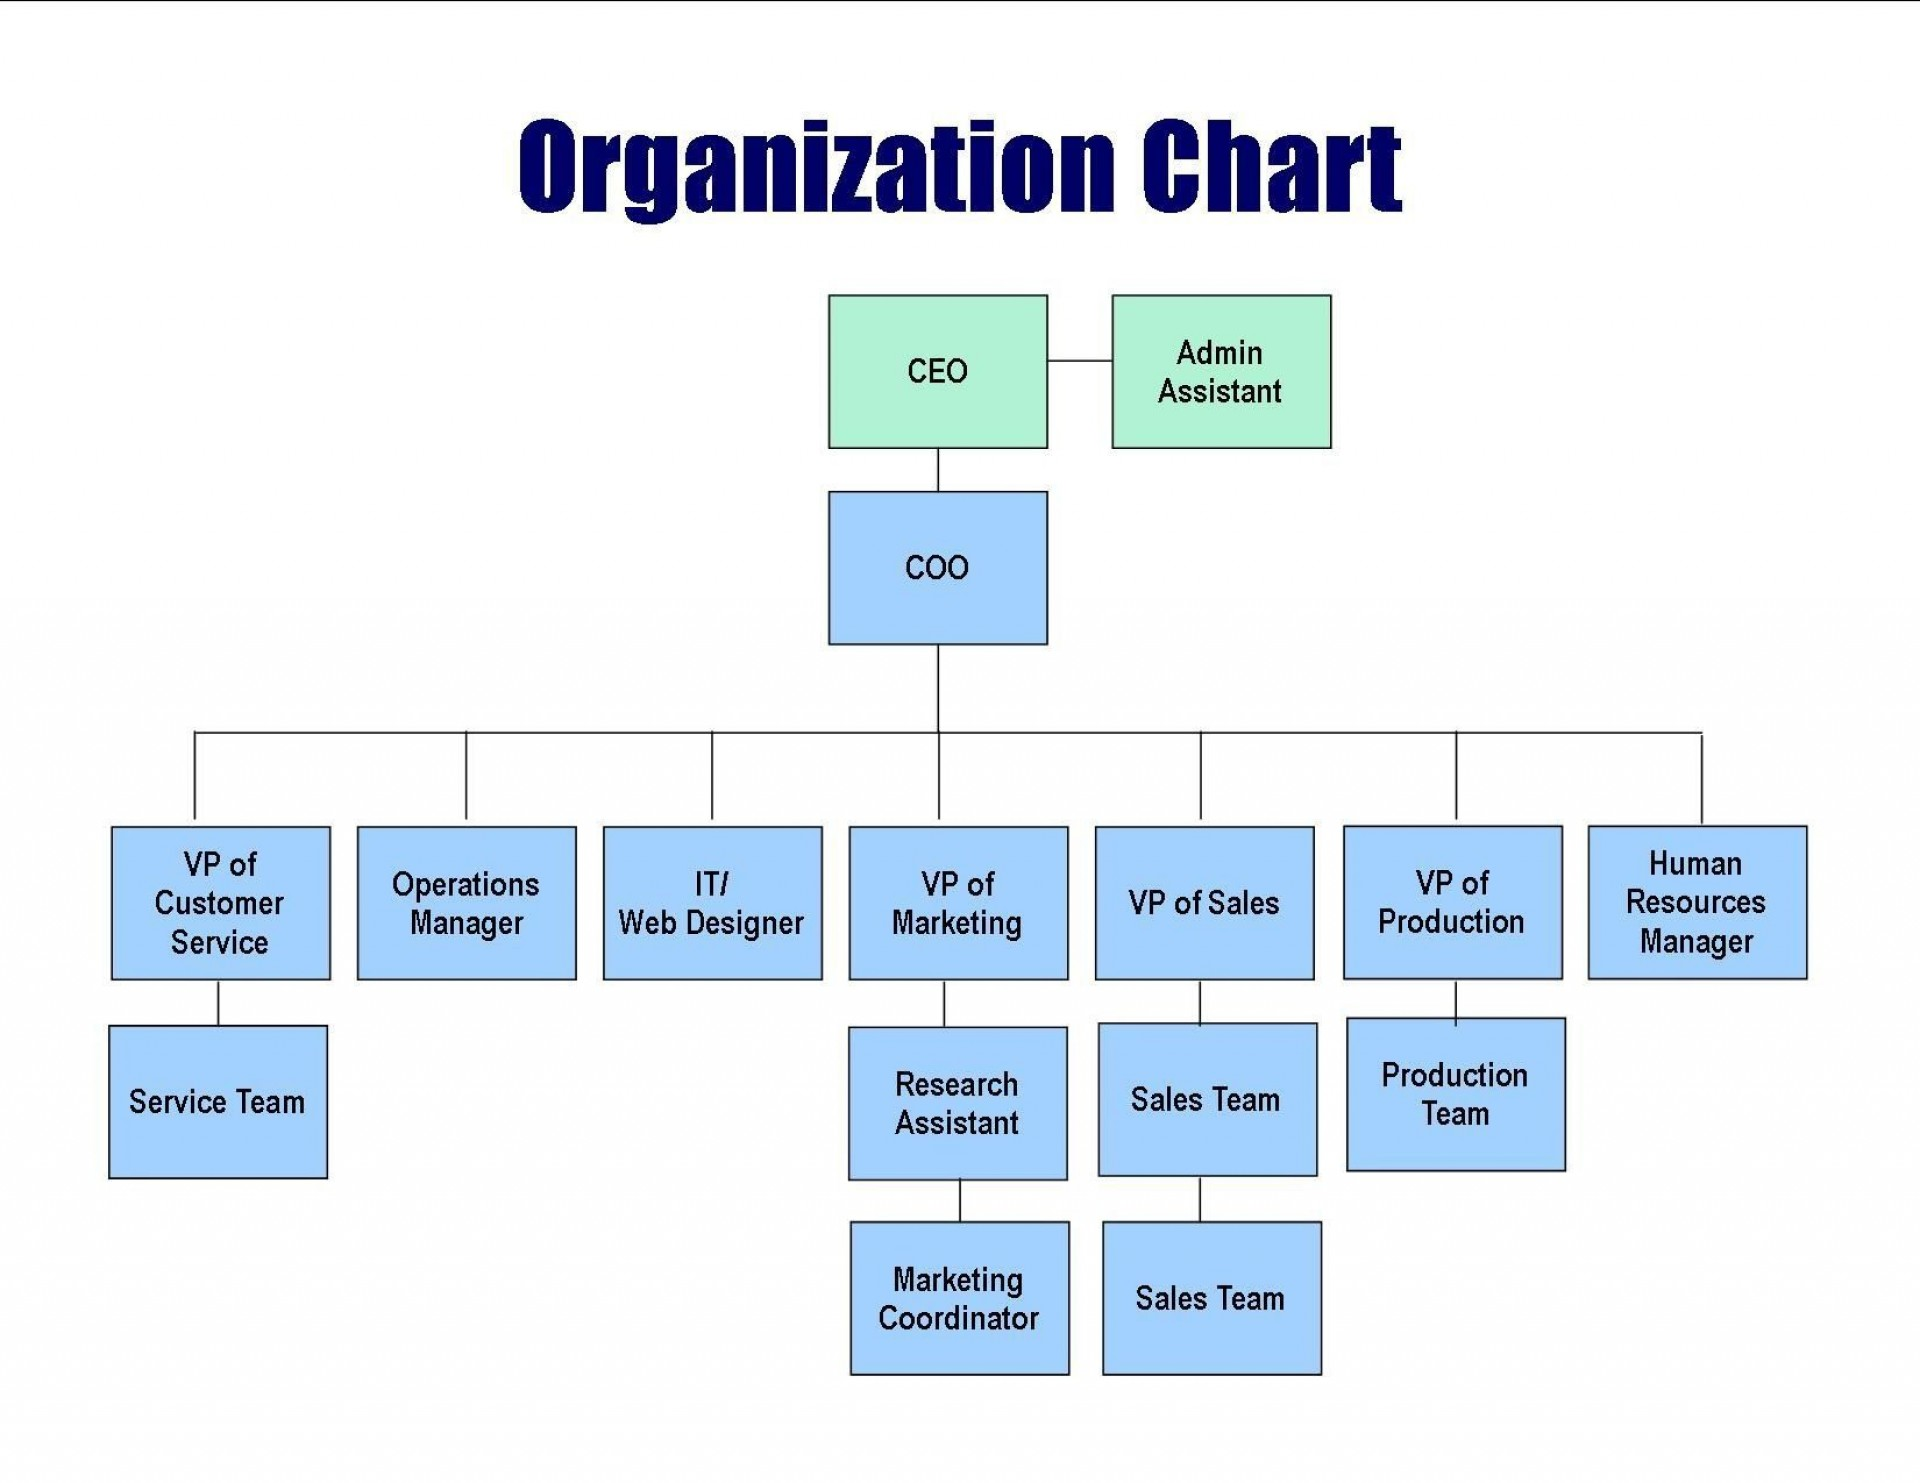 005 Beautiful Microsoft Organizational Chart Template Image  Templates Visio Org M Office Organization Powerpoint1920